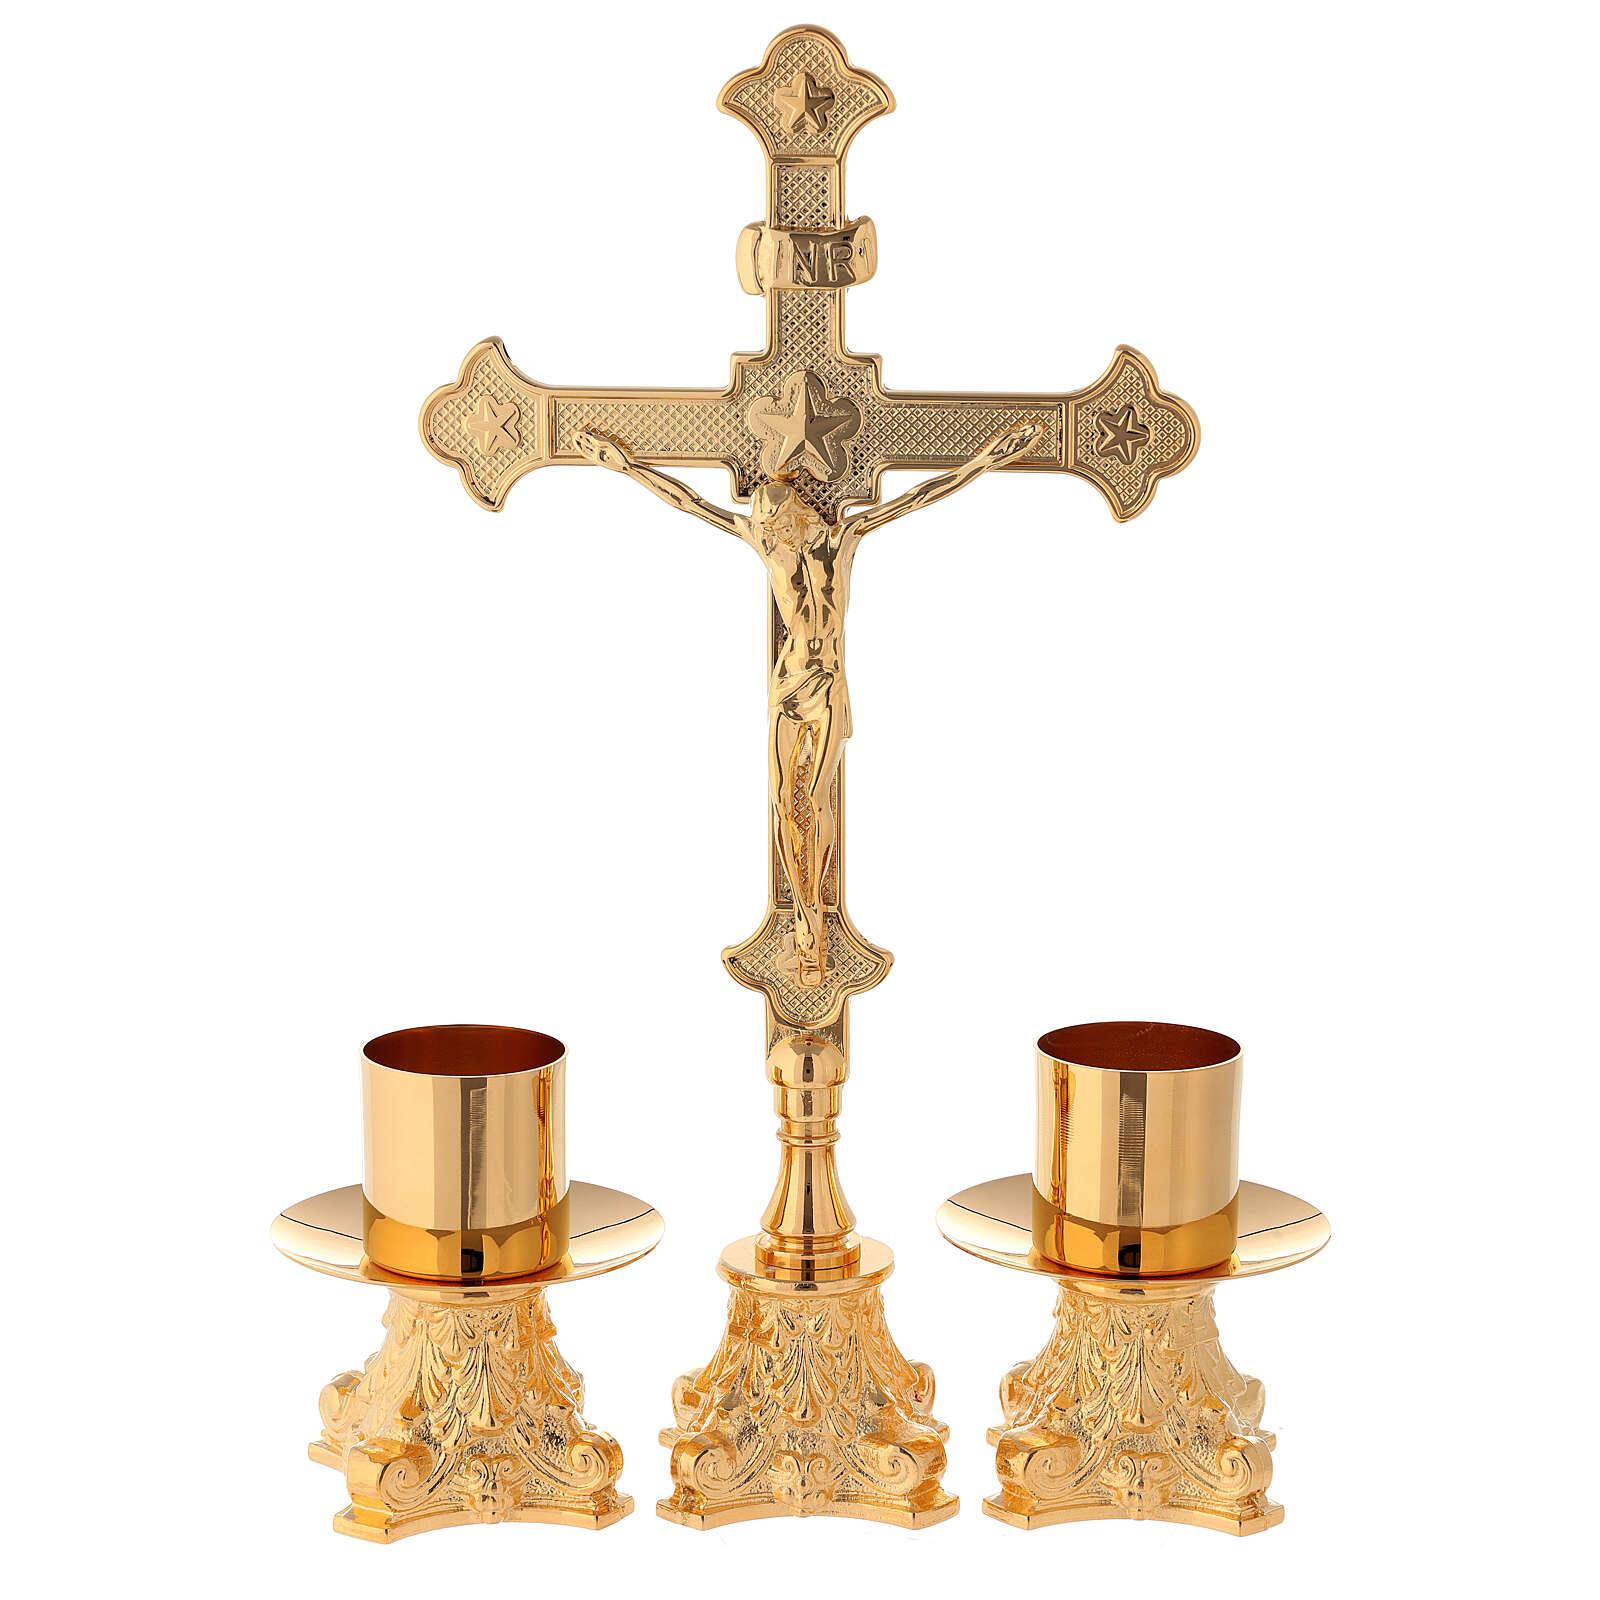 Candeleros y cruz de altar latón dorado 24k 30 cm 4